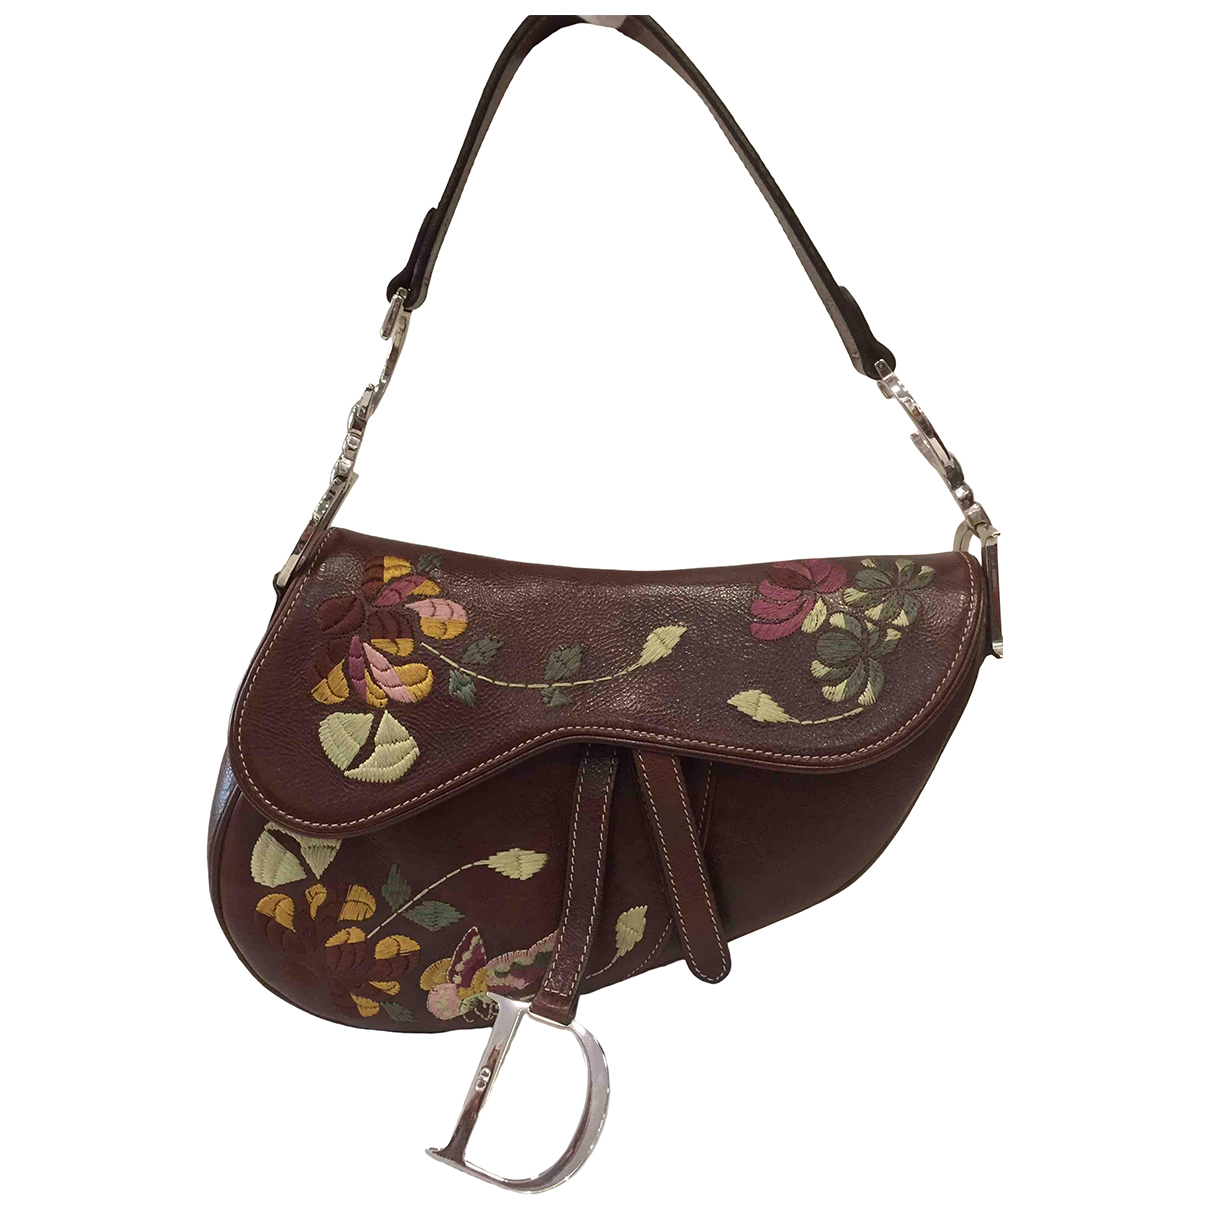 Dior Saddle Brown Leather handbag for Women N